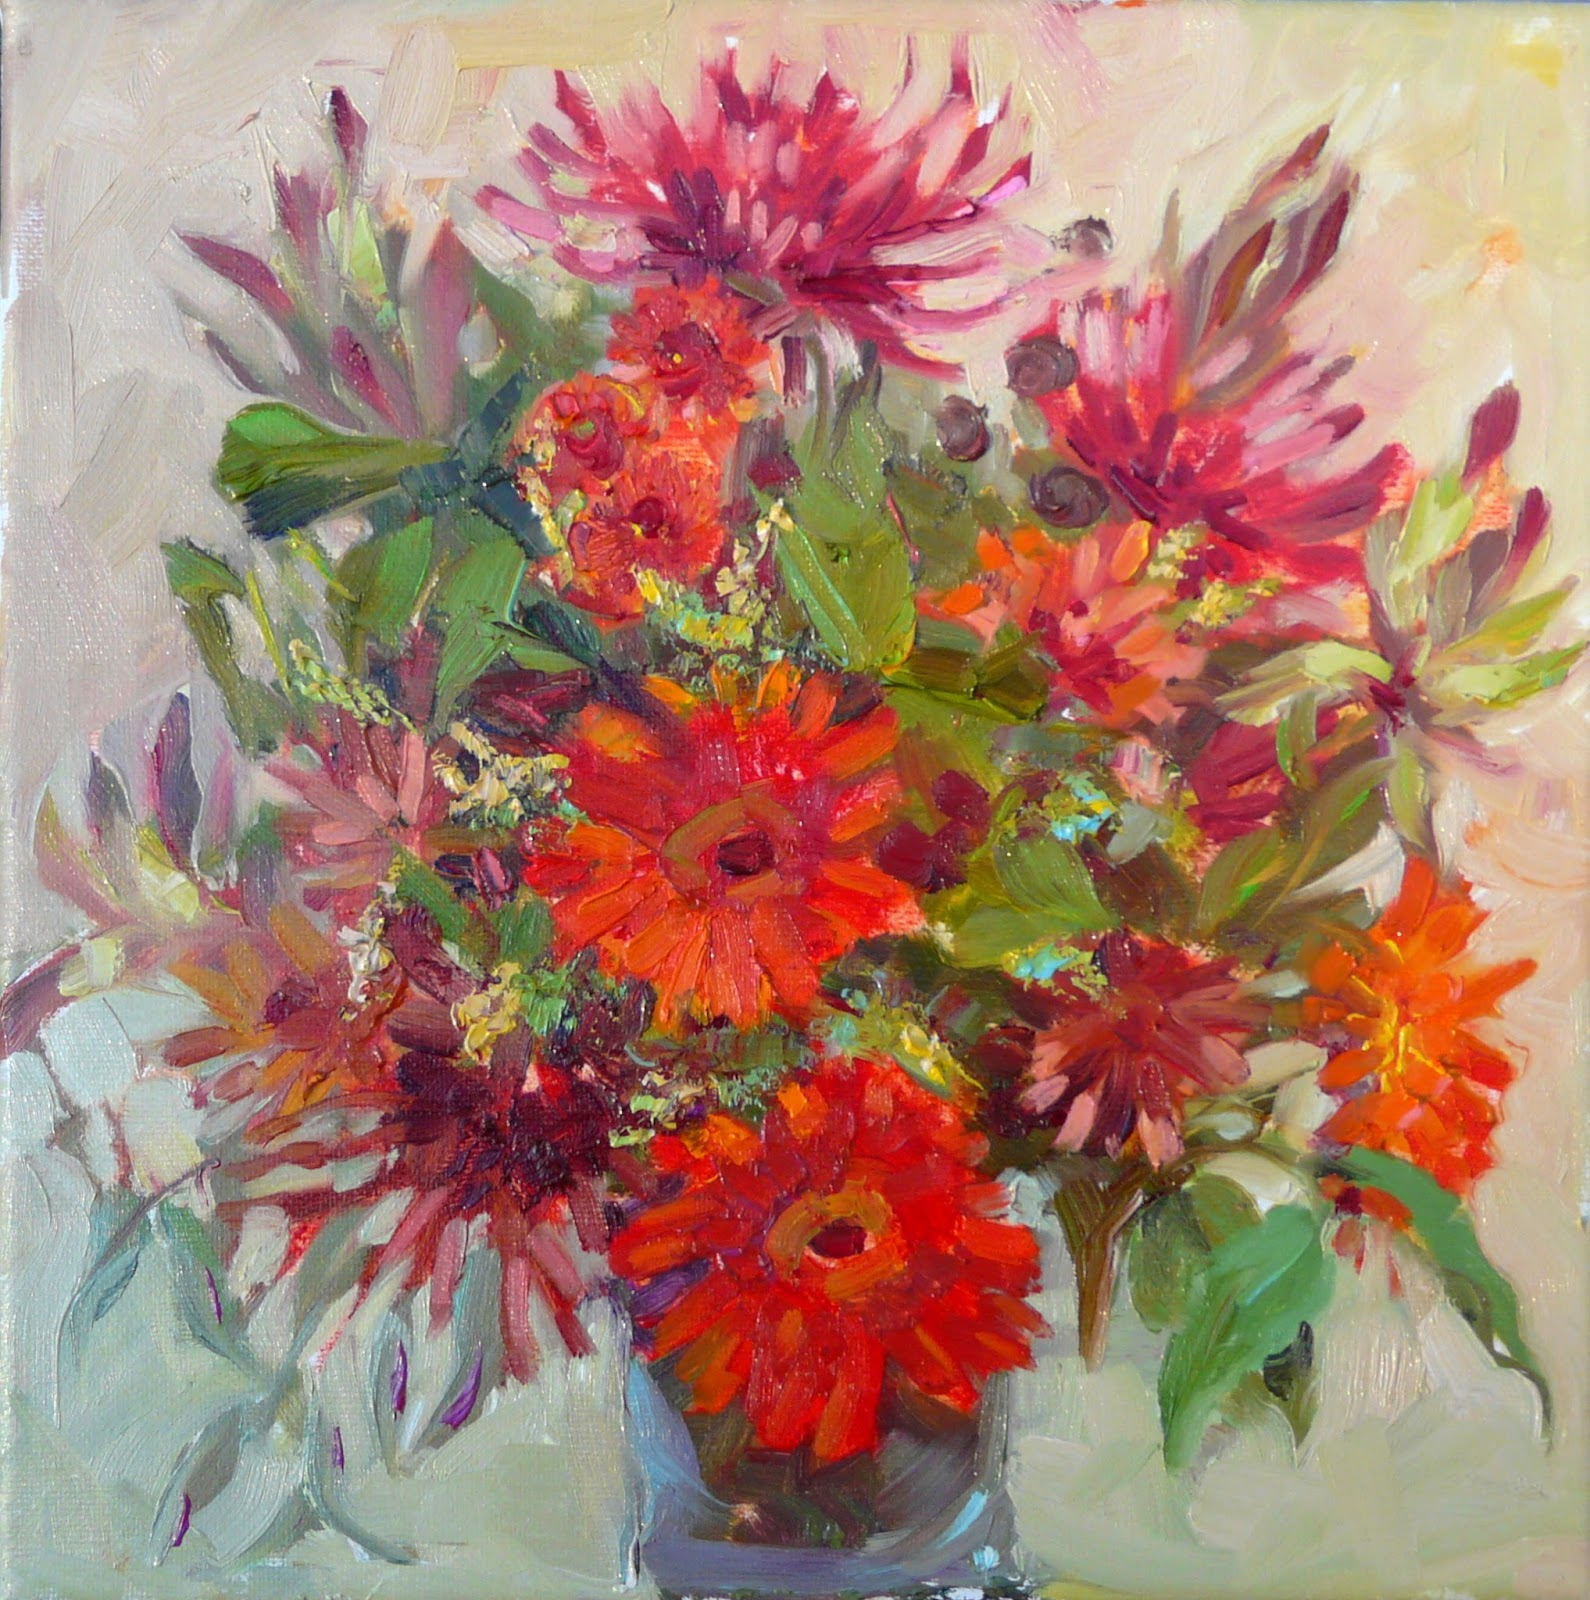 NovemberThanksgiving Flowers